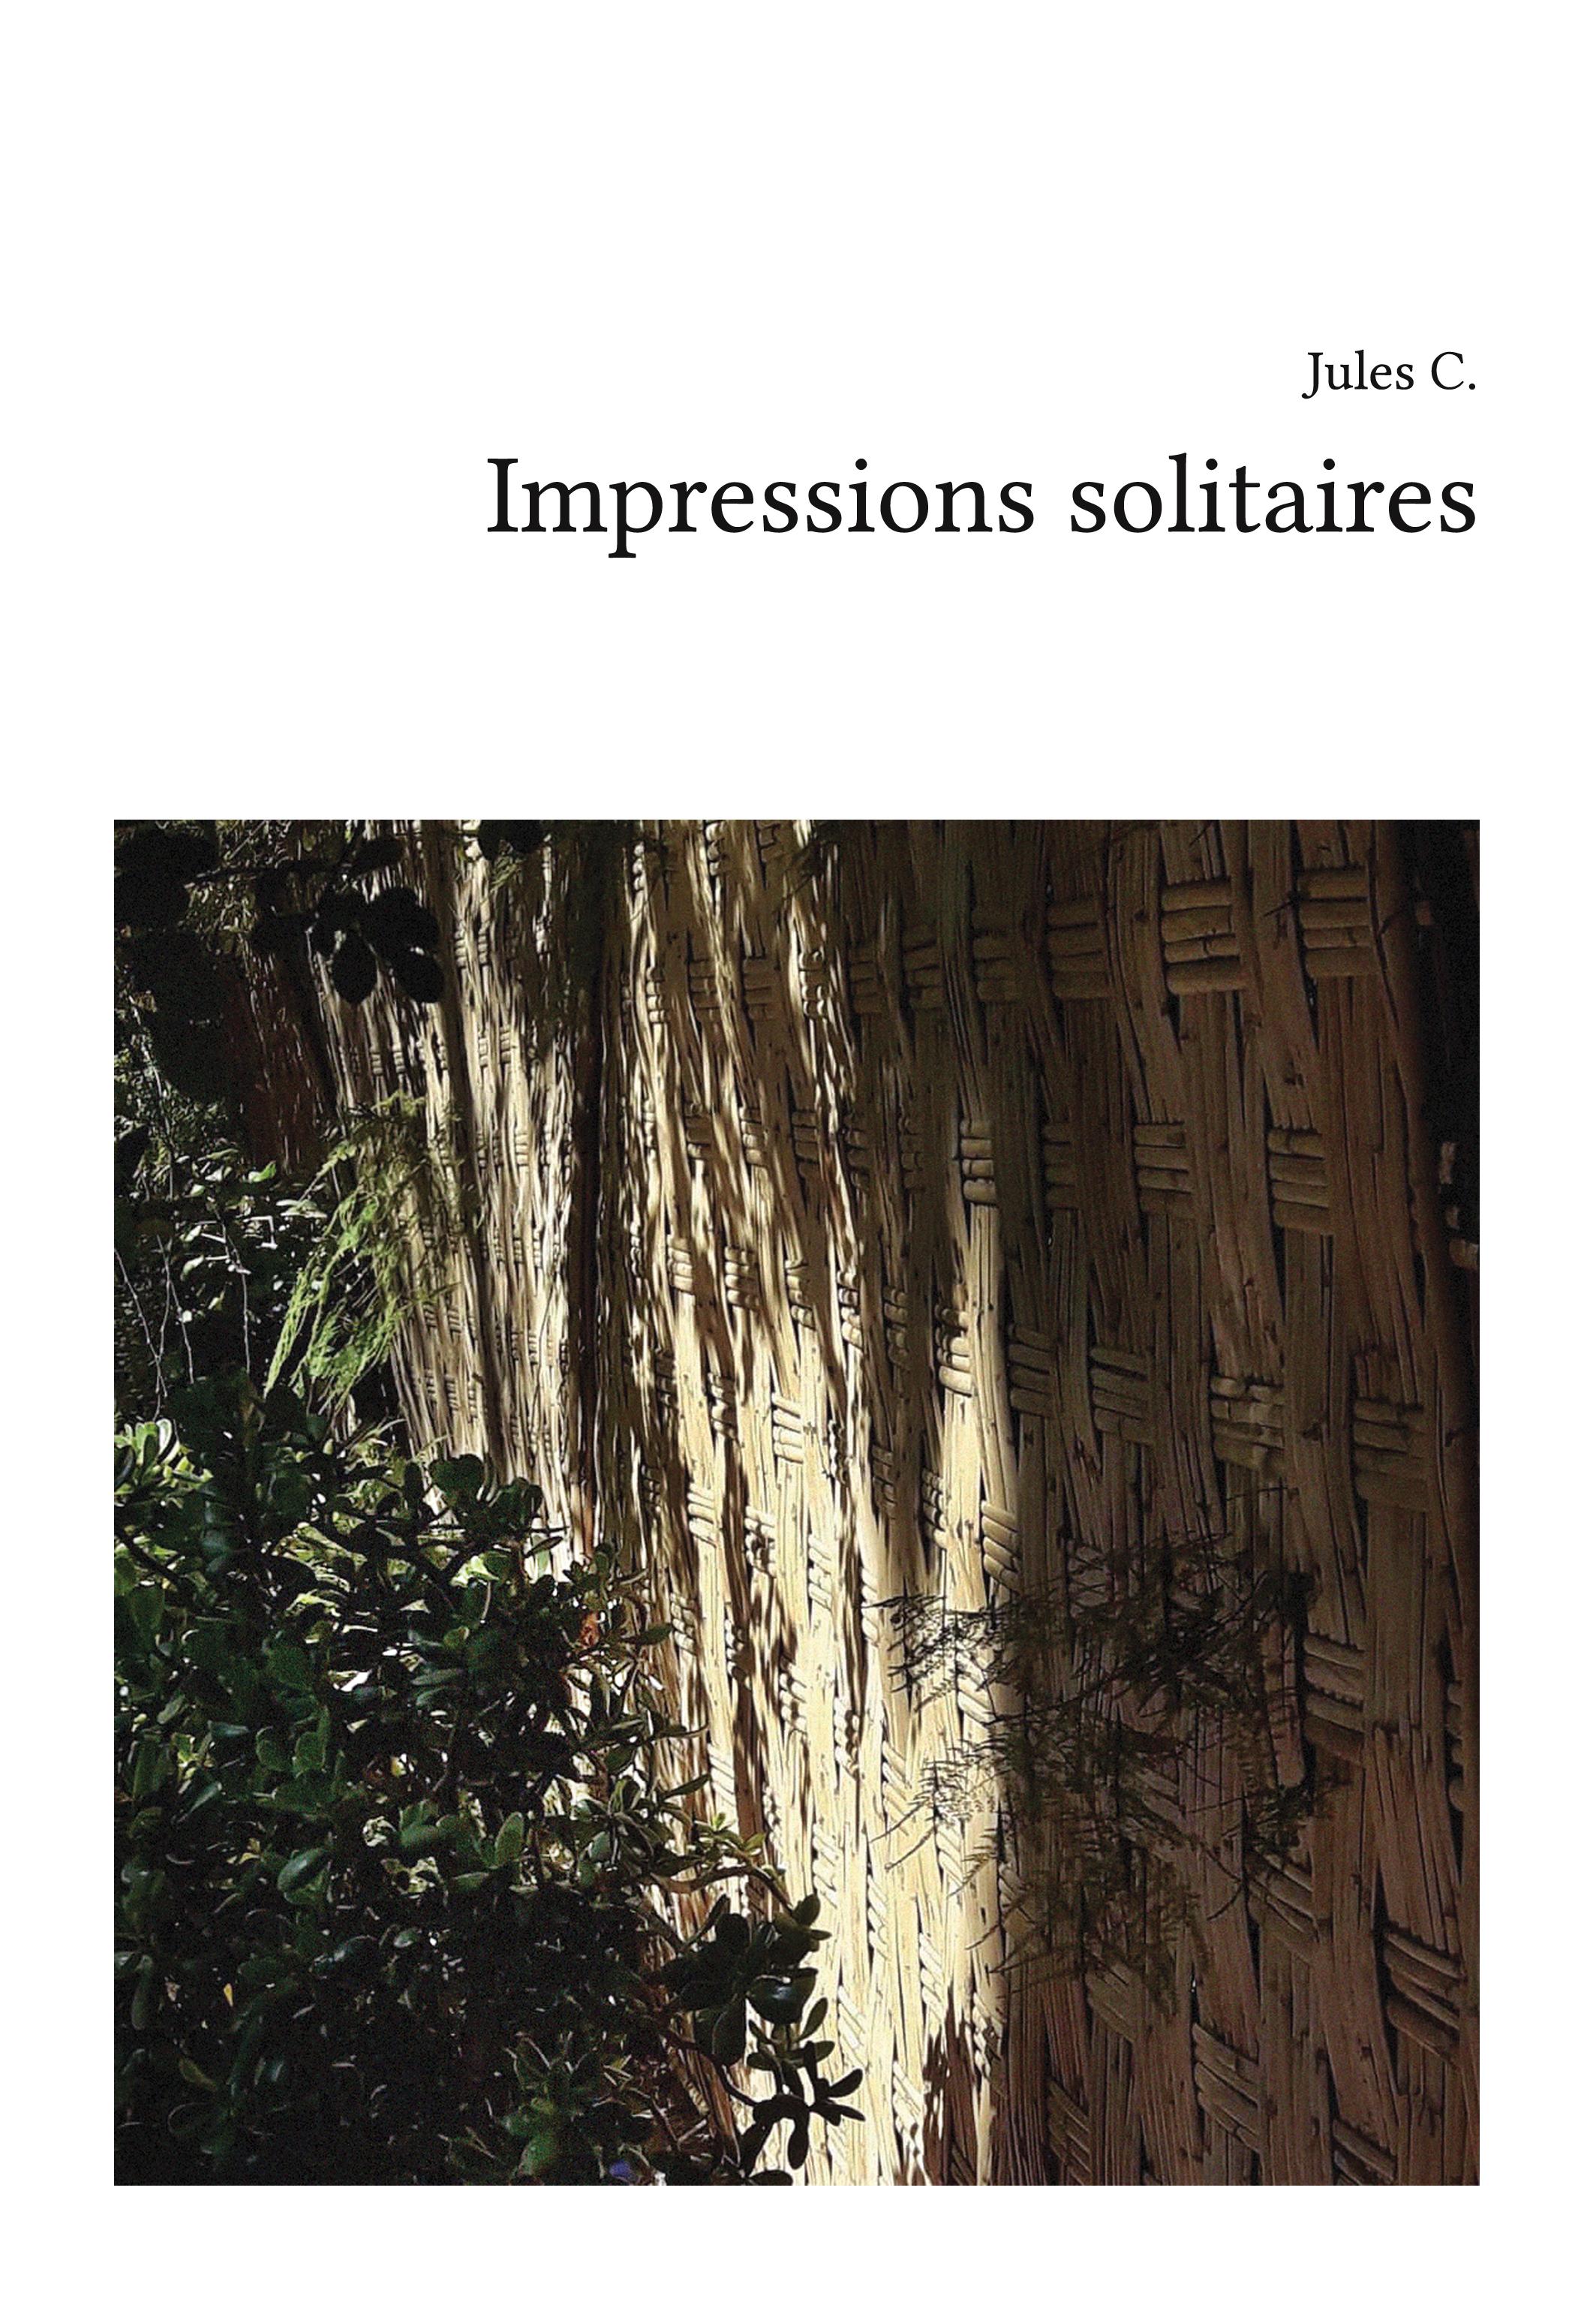 IMPRESSIONS SOLITAIRES